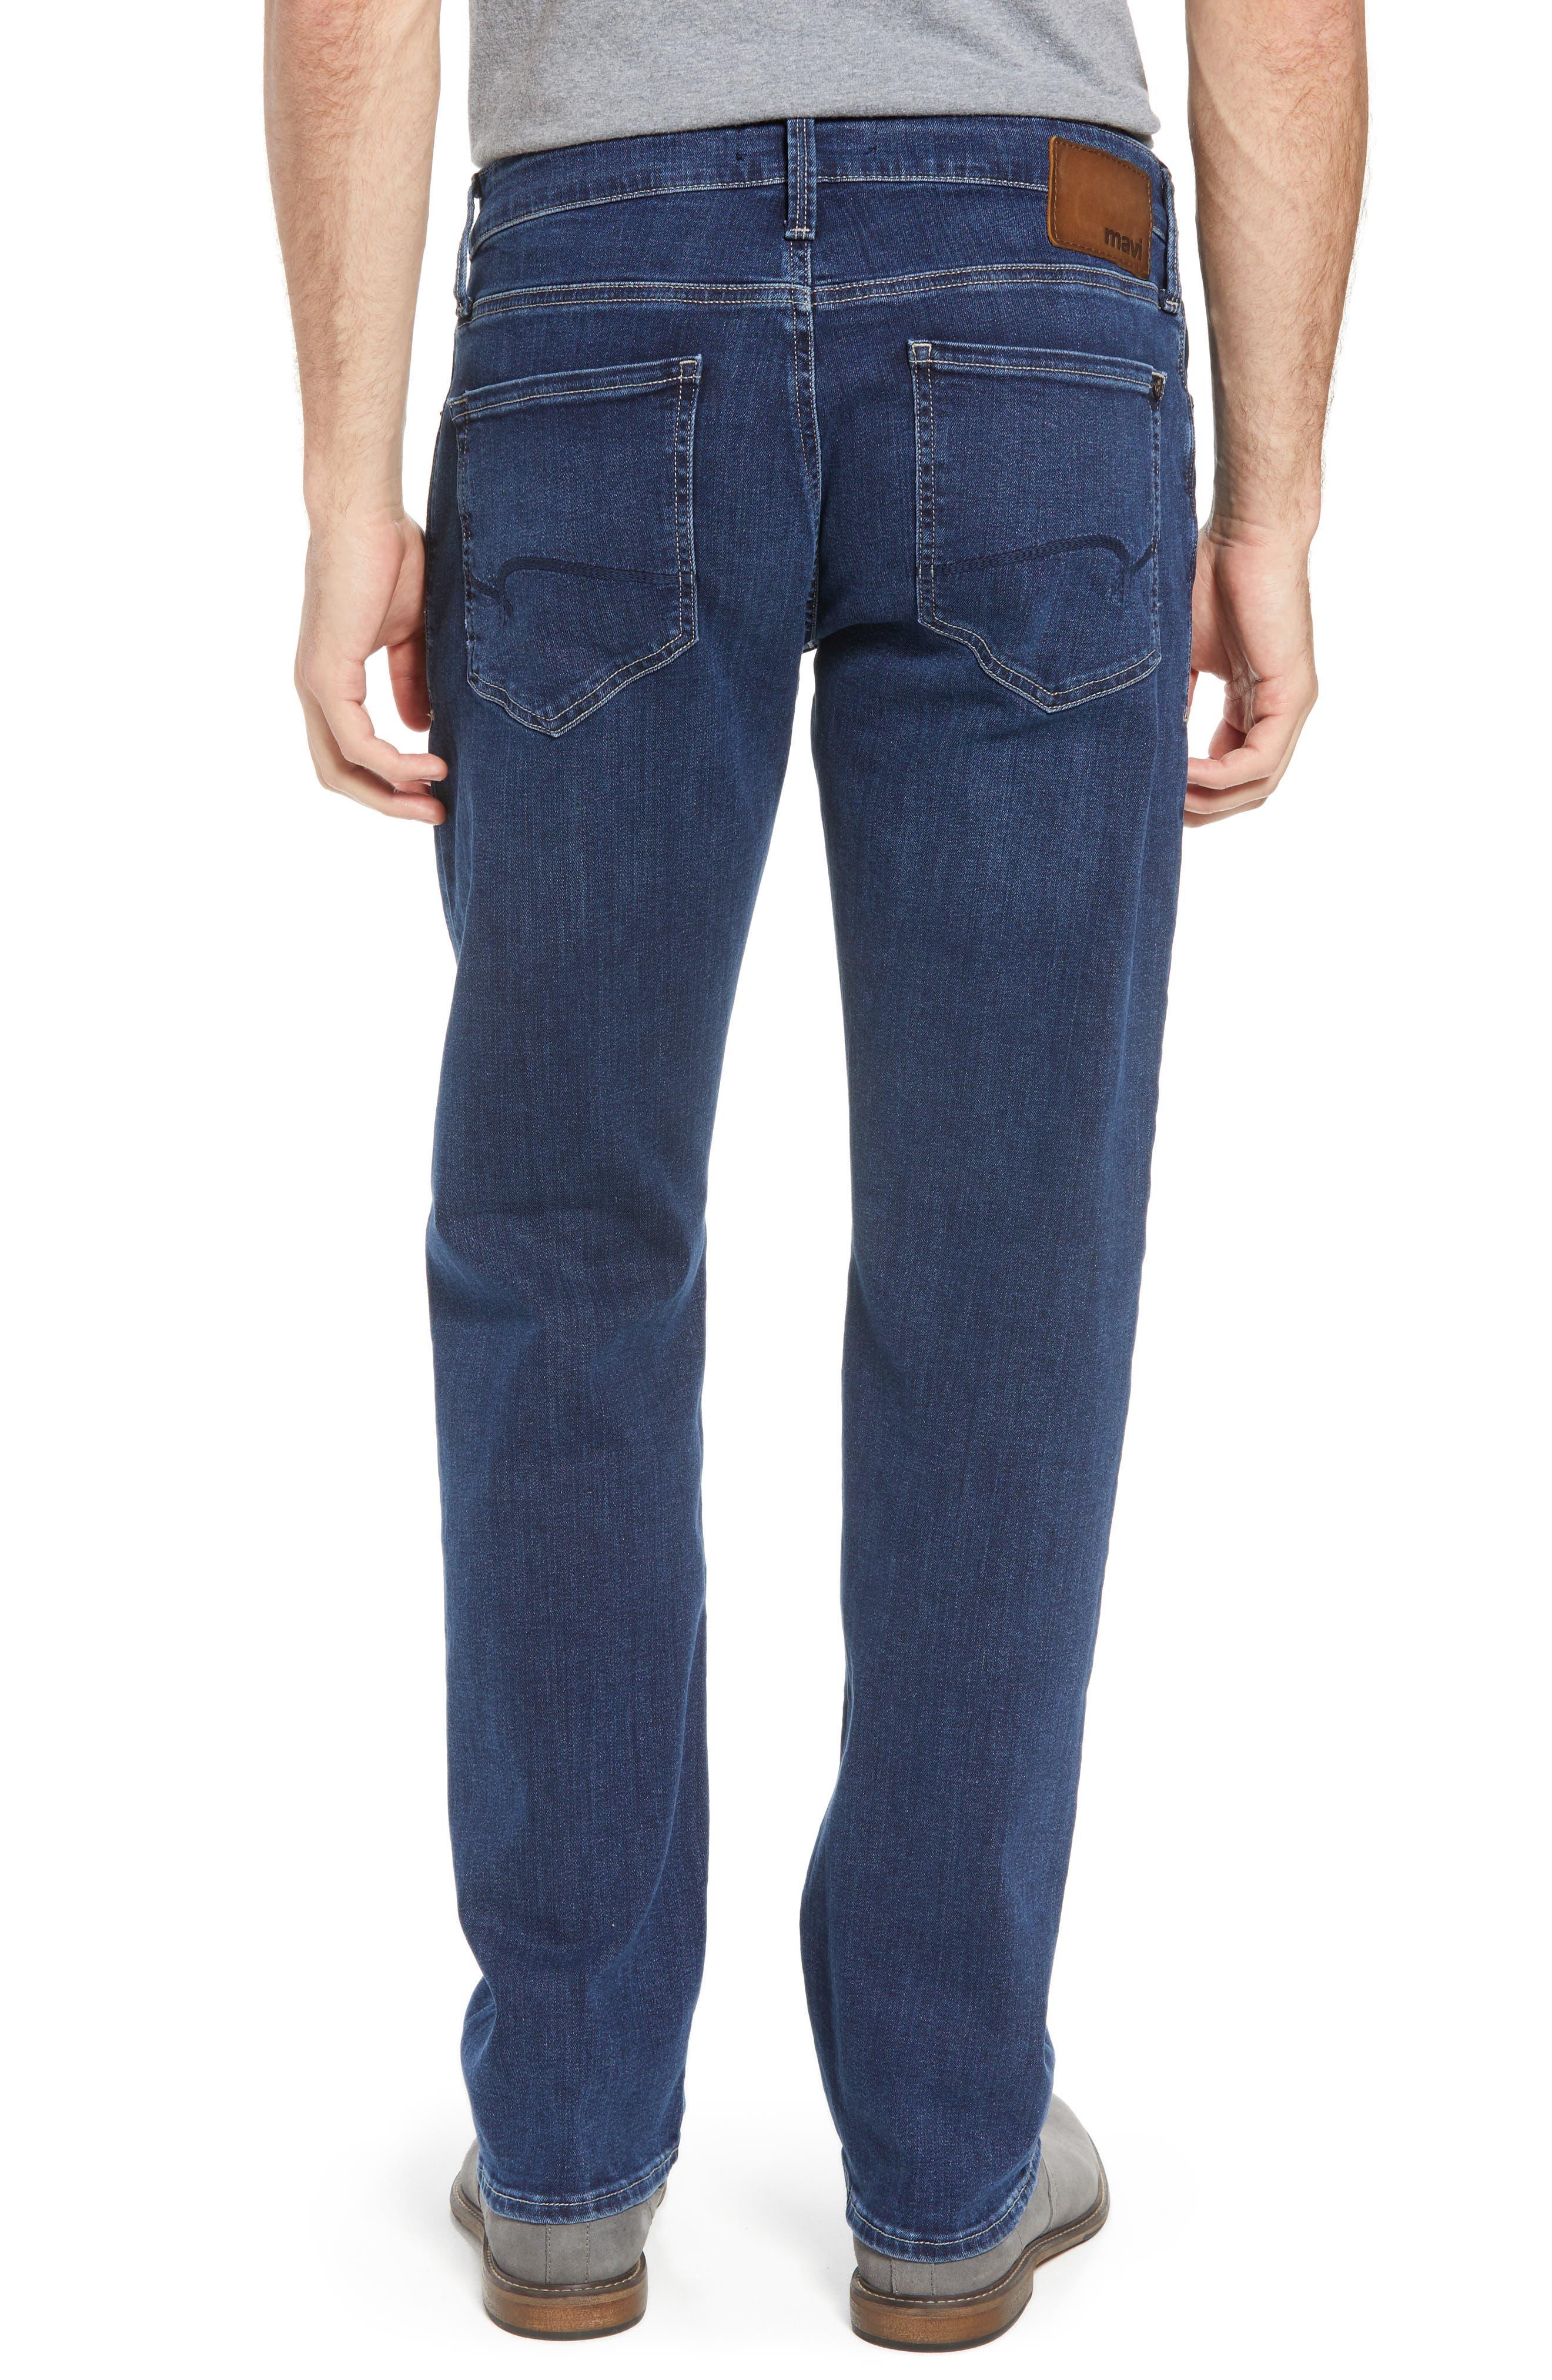 Zach Straight Leg Jeans,                             Alternate thumbnail 2, color,                             Dark Blue Williamsburg